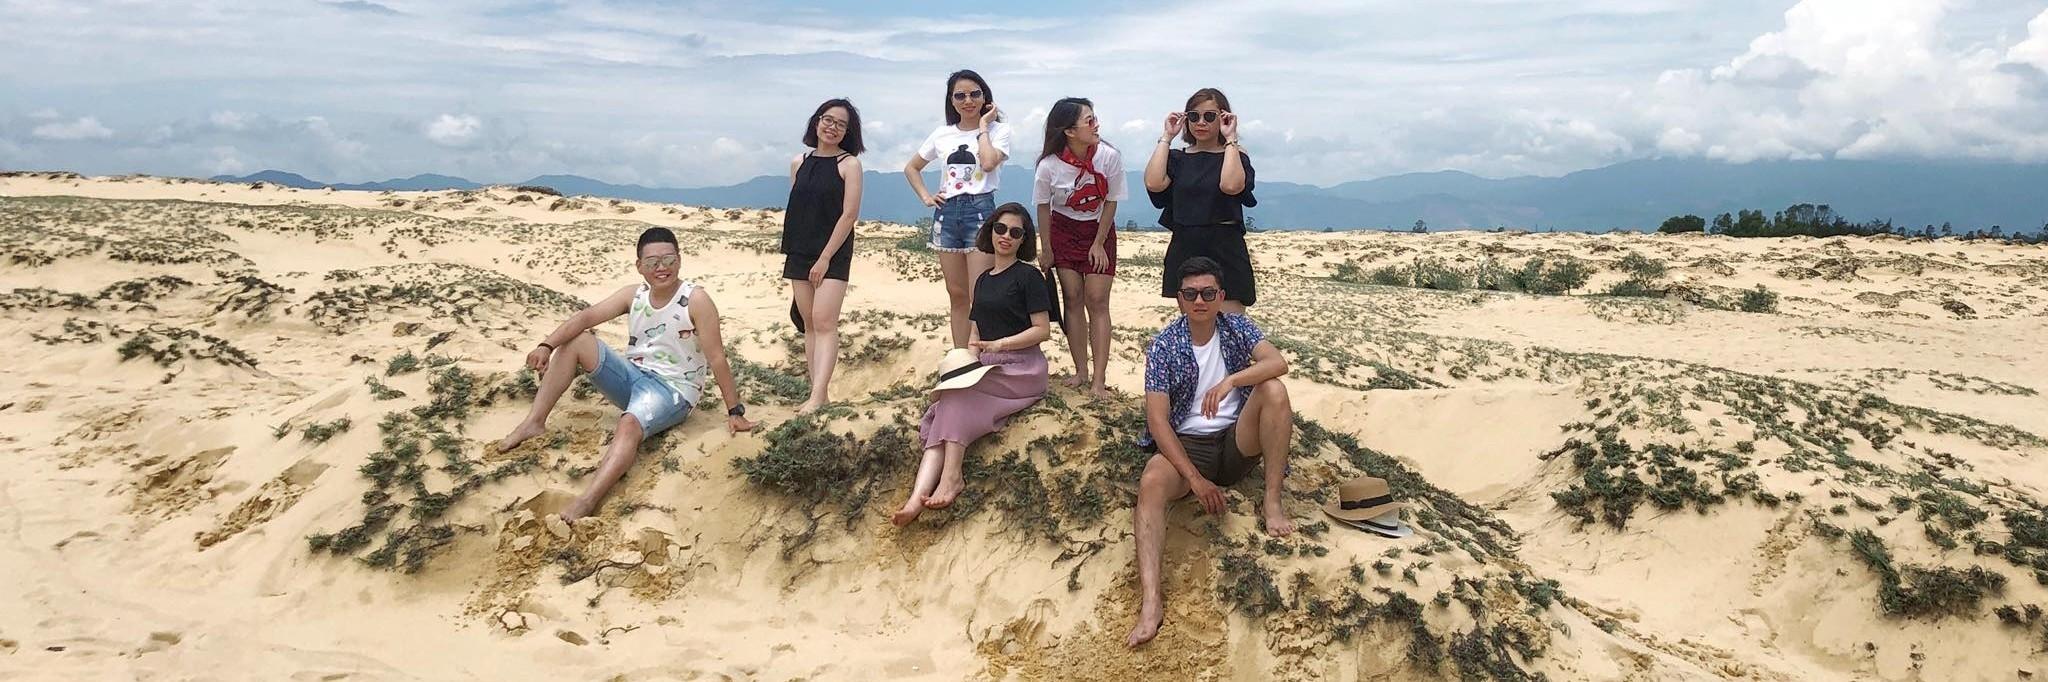 http://gody.vn/blog/ad3041/post/huong-dan-dang-ky-va-thiet-lap-trang-travel-blog-ca-nhan-67